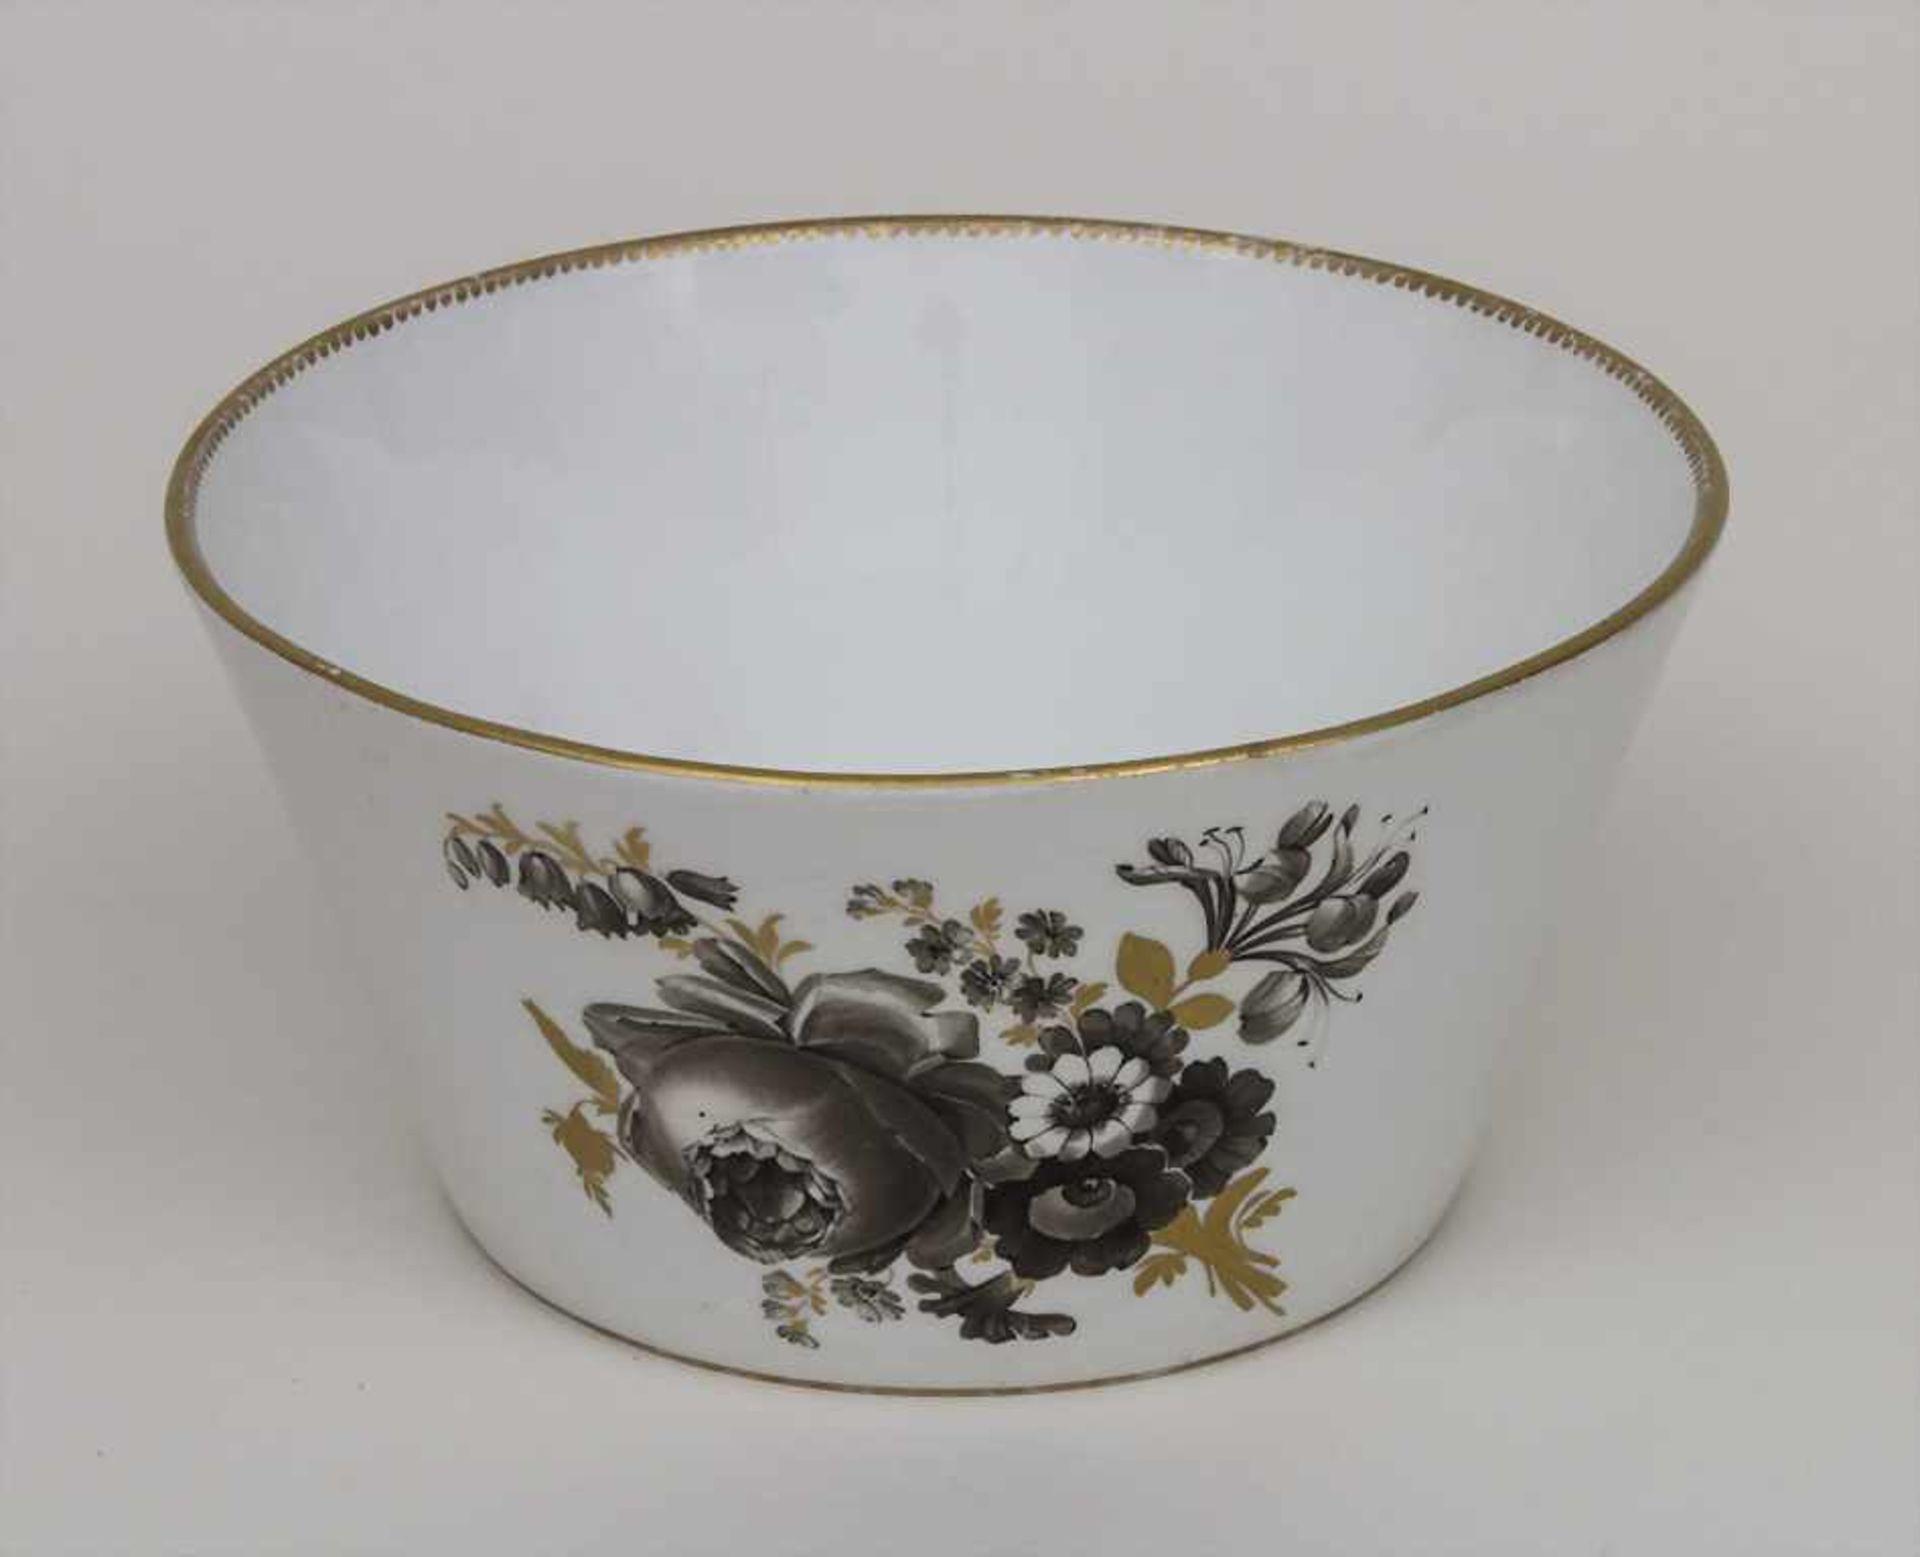 Schale mit Blumenbouquets / A bowl with bouquets of flowers, Meissen, um 1774-1814 Material: